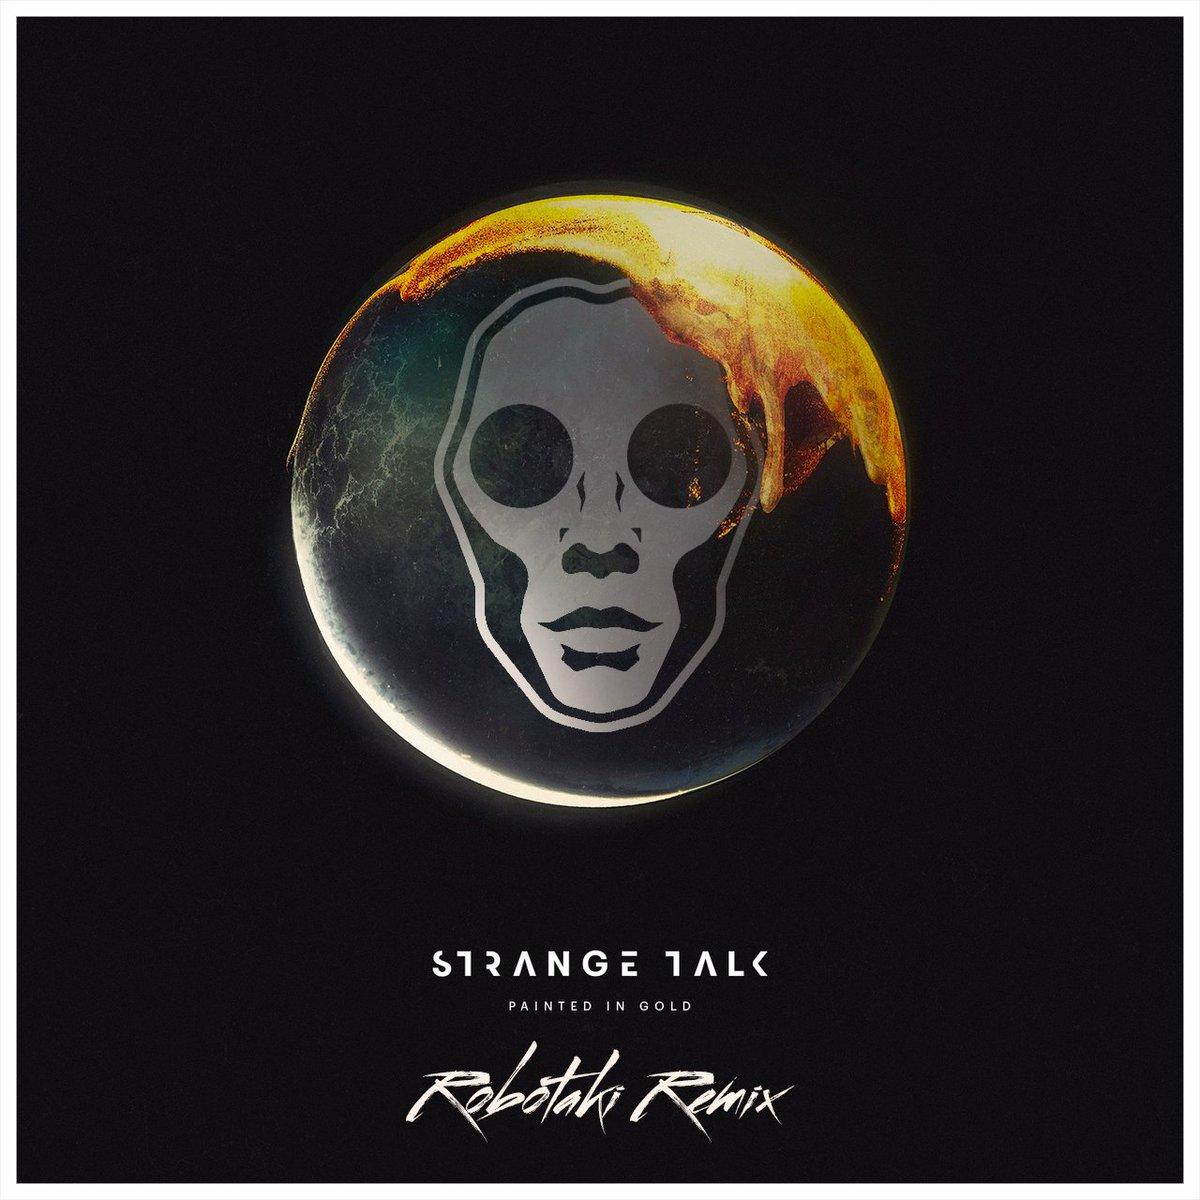 My favourite remix I've ever done. Listen to my remix of @Strange_Talk via @billboarddance: https://t.co/yvYB8j7GOU https://t.co/h7vyEJk0VS